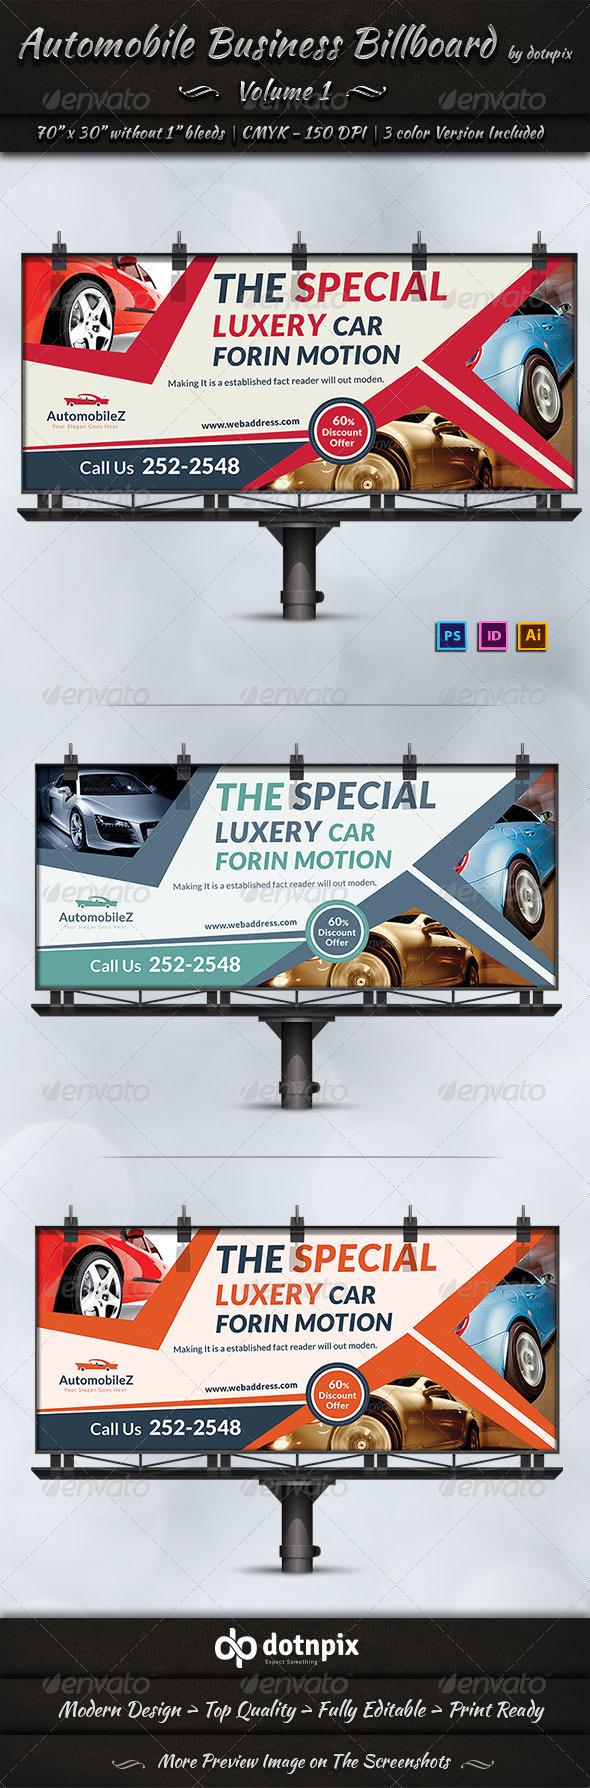 GraphicRiver Automobile Business Billboard Volume 1 6965378